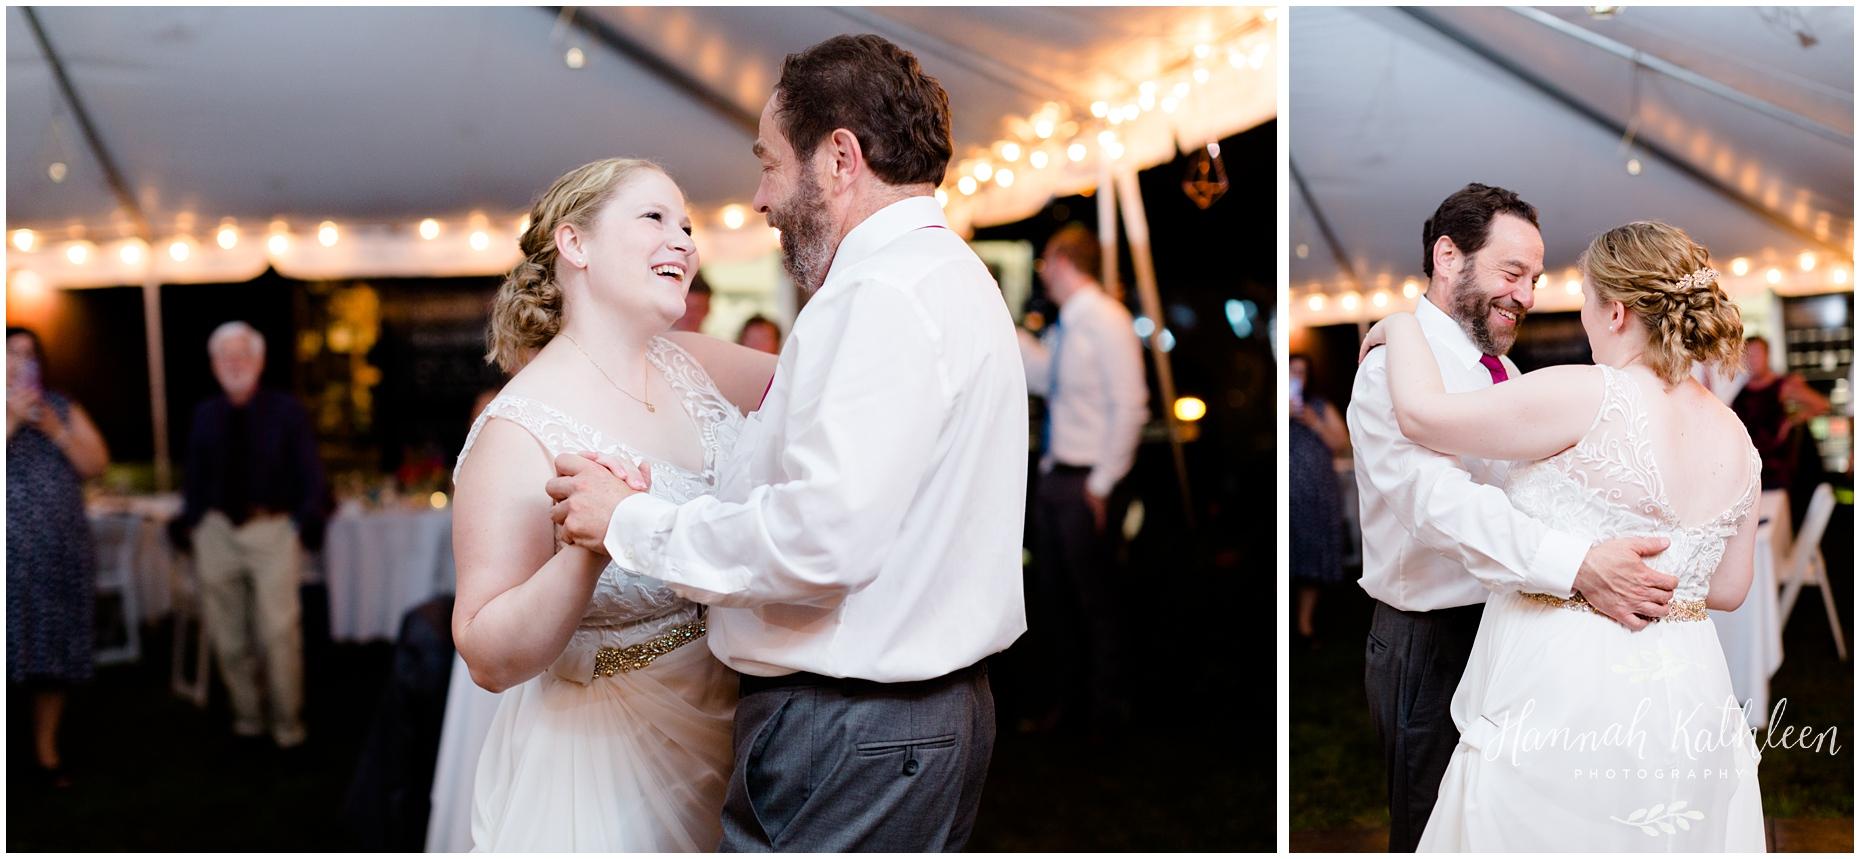 corban-maggie-massachusetts-vermont-intimate-backyard-wedding-photography